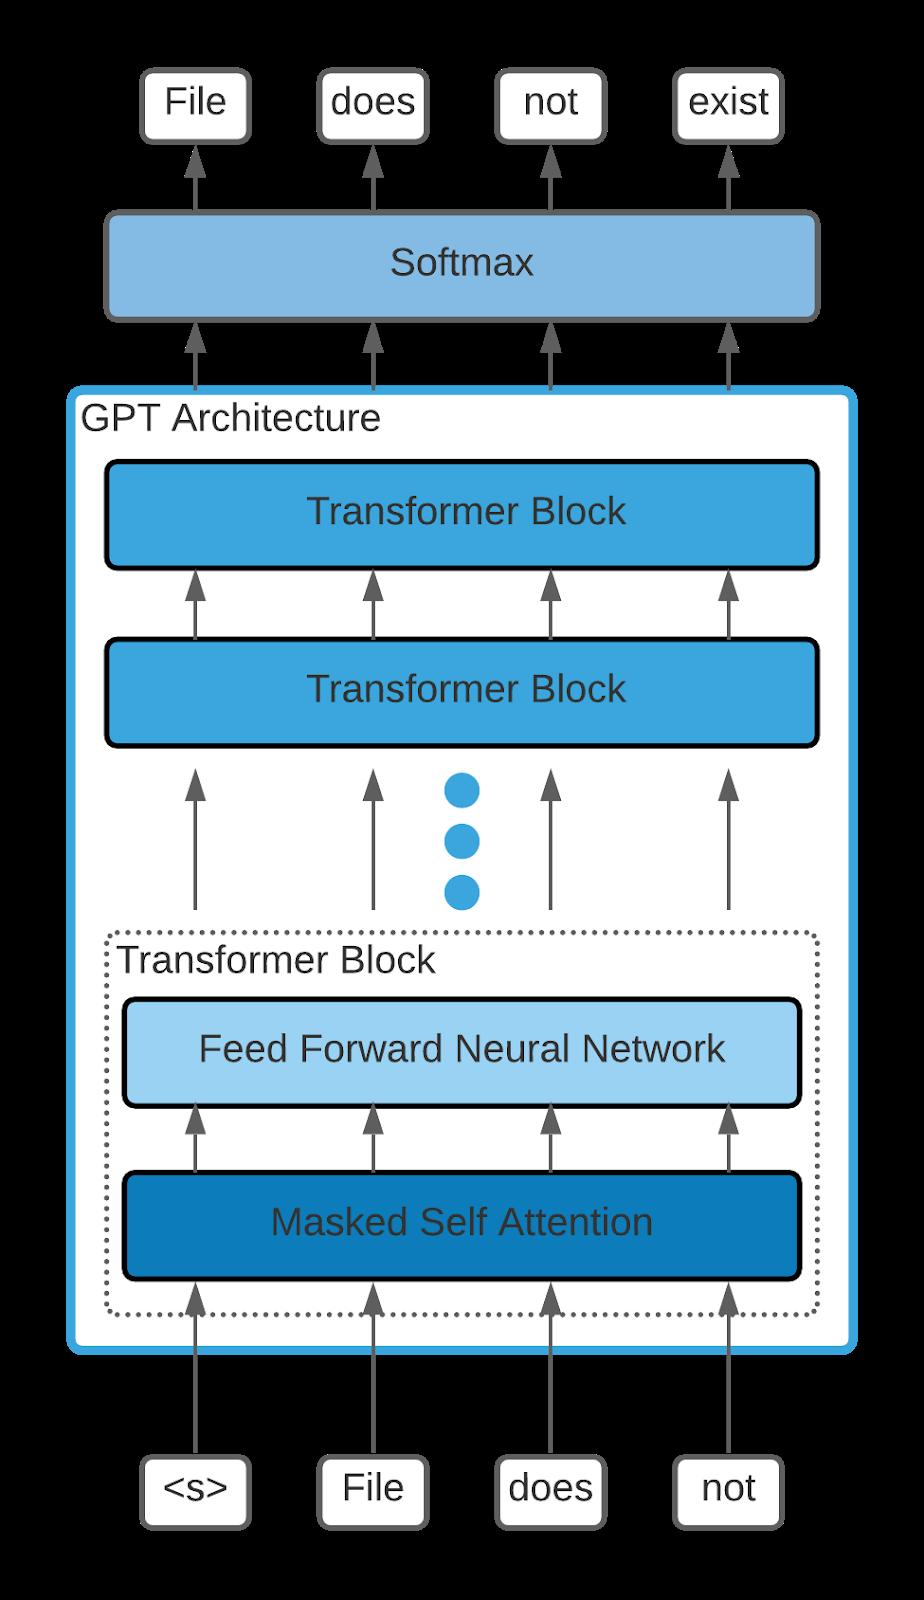 GPT-style language model architecture